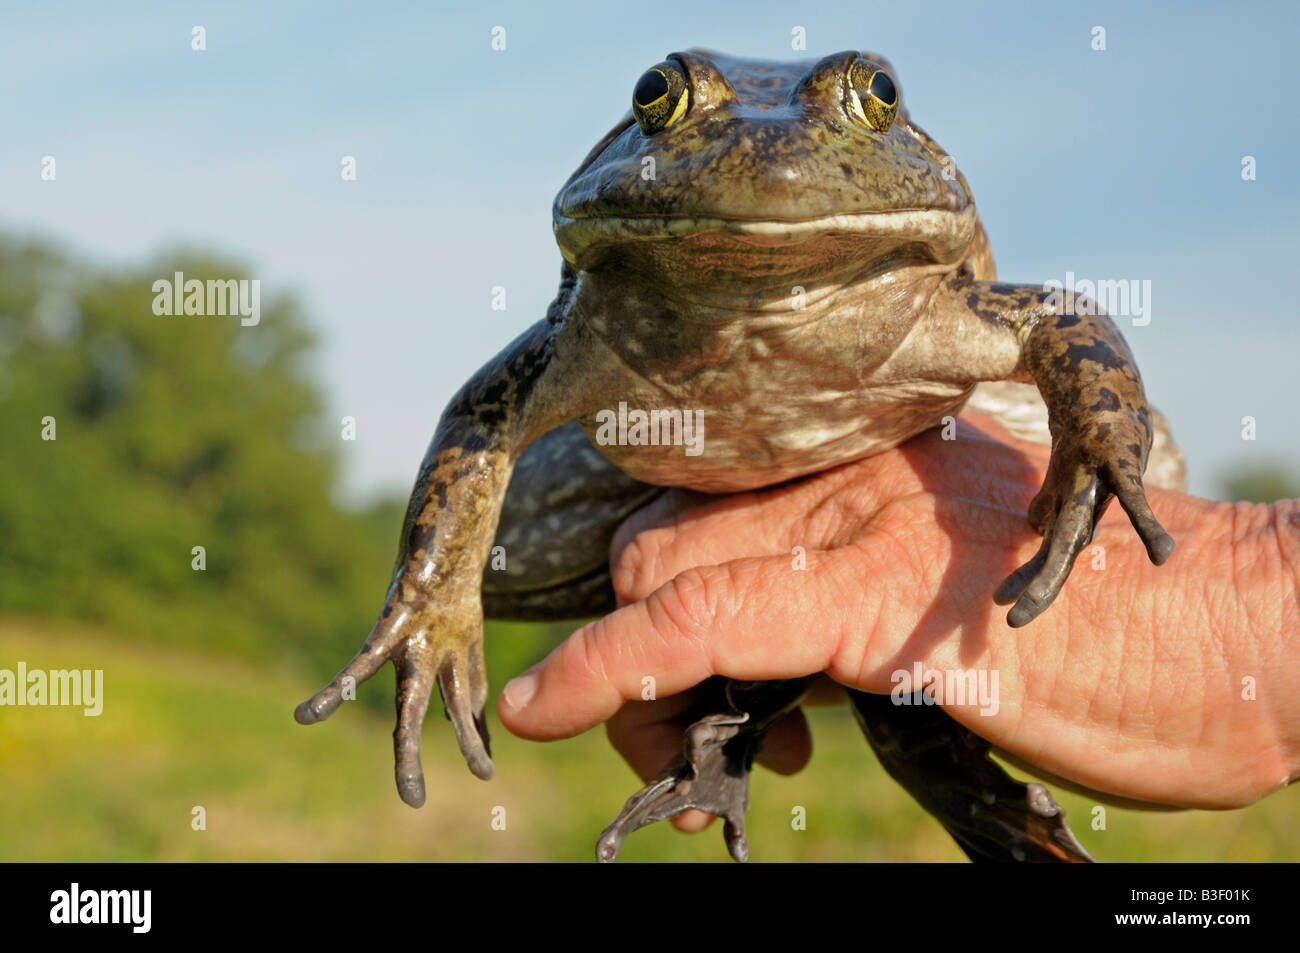 American Bullfrog (Rana catesbeiana), adult held in hand Stock Photo